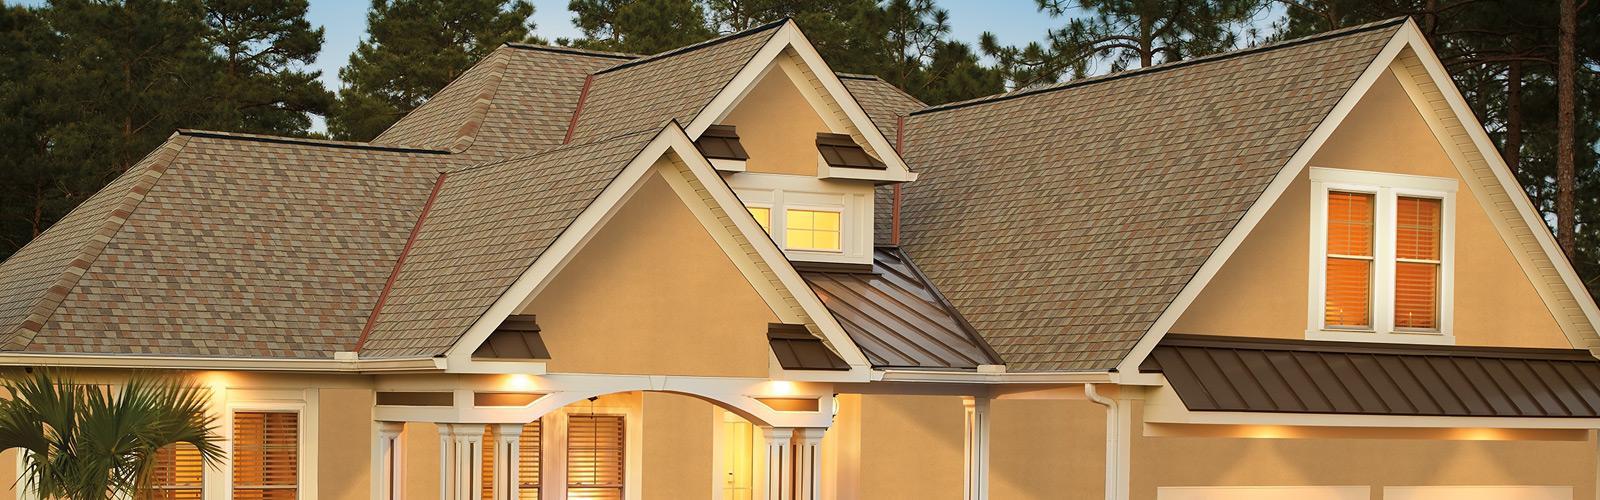 Roof Repair Average Cost